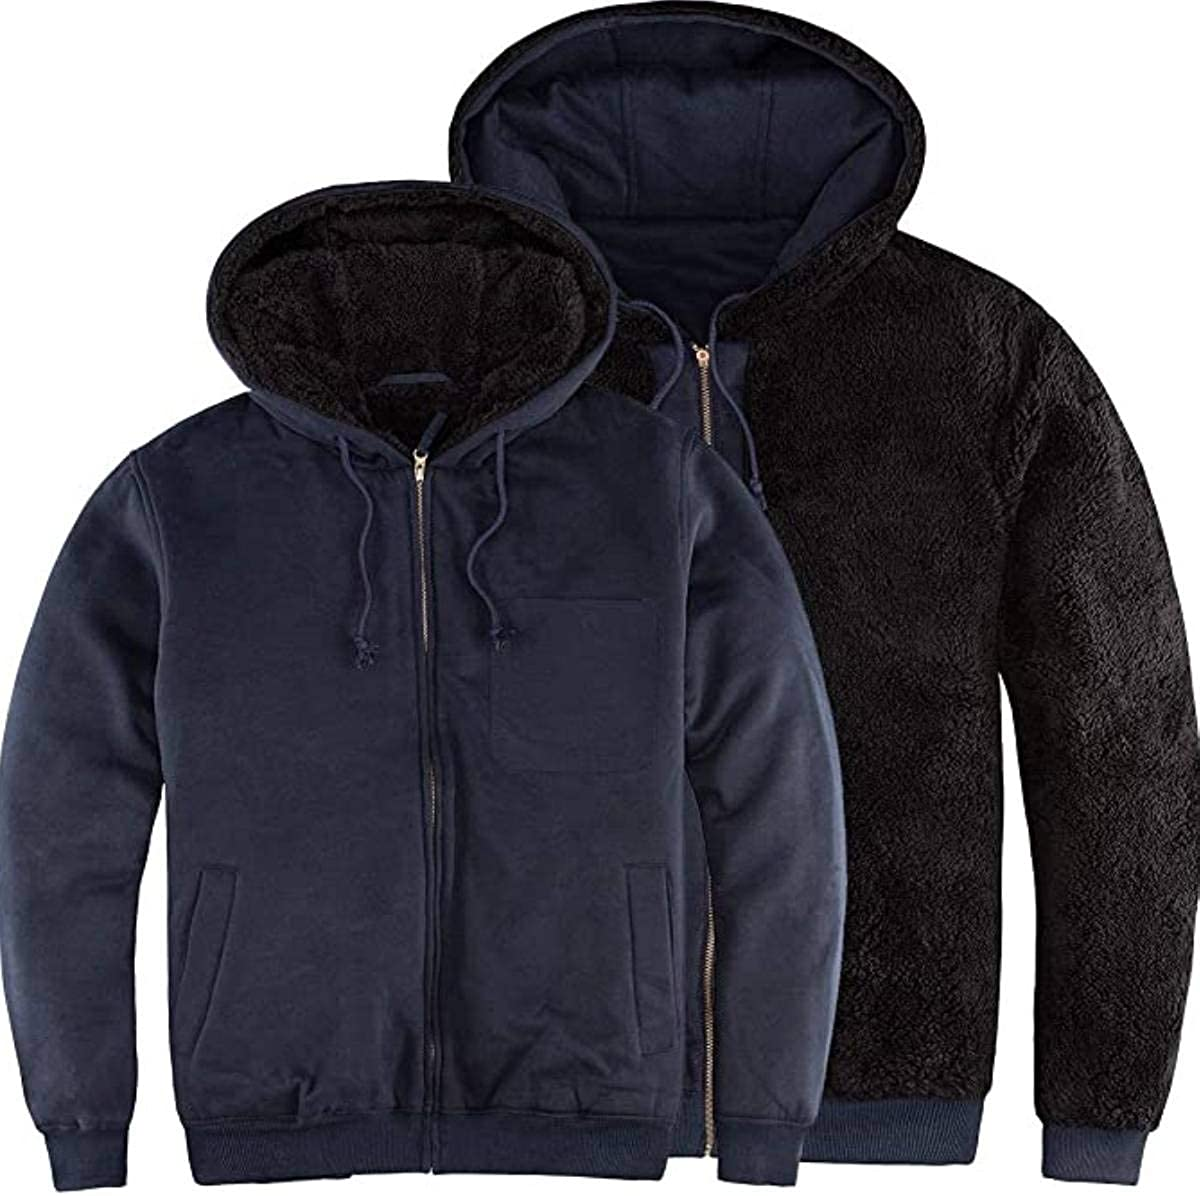 Hoodies for Men Heavyweight Fleece Lined Sherpa Jacket Zip Up Hooded Sweatshirt